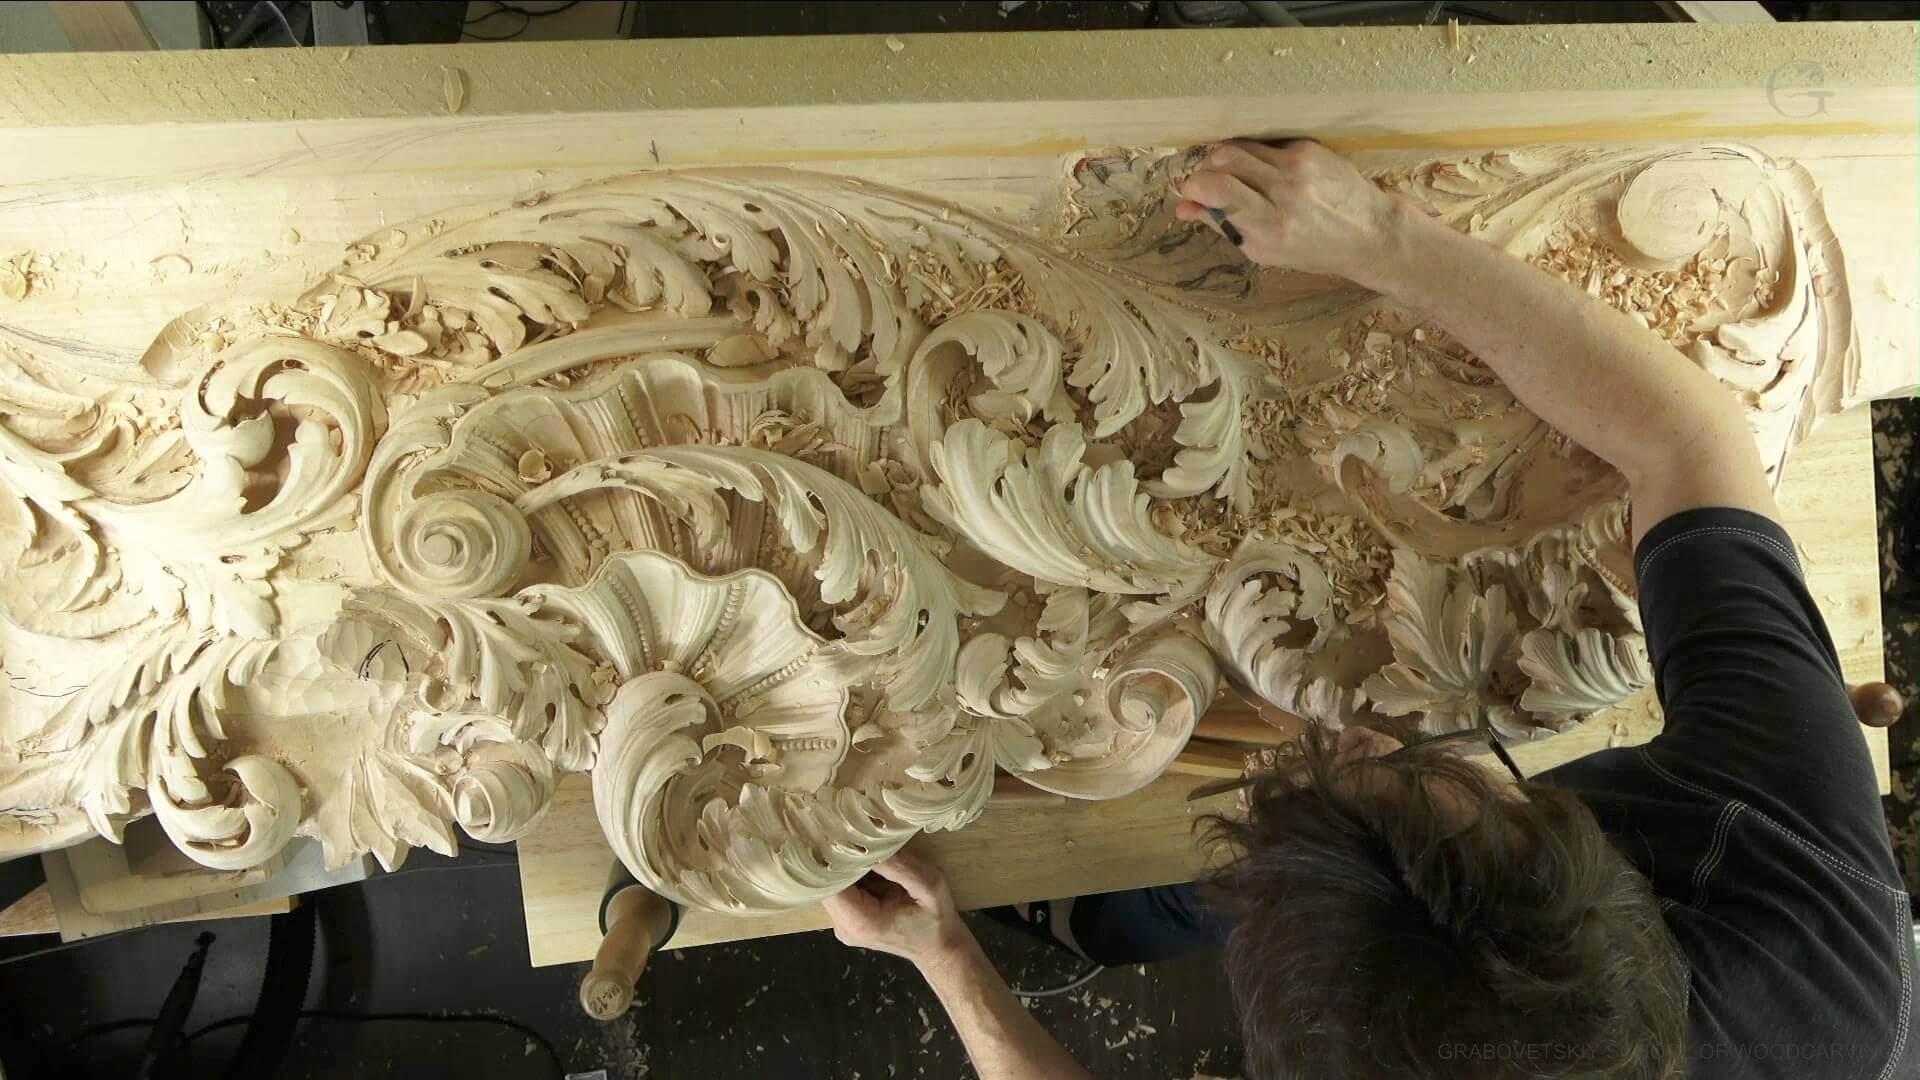 Wood Carving School online- Carving Venice Room Woodcarving course - Authentic Rococo 15th century design - Woodcarving Course online https://schoolofwoodcarving.com/ @woodcarvergrabovetskiy #todaysmaker #craft #skills #makersgonnamake #knowledge #carving #woodworker #woodwork #wooddesign #woodfurniture #interiordesign #carvingwood #woodworking #woodlovers #carpenter #dowoodworking #diy #finewoodworking #woodcraft #artisan #woodcarving #woodart #finewoodworking #handcrafted #idea #woodcarver #woodcarvers #woodcarvingart Learn Wood Carving in Rococo style 15th 16th-century Design. Woodcarving School online. School of Woodworking online. Afrikaans: Leer houtsneewerk in Rococo-styl uit die 16de eeu-ontwerp. Houtsneeskool aanlyn. Skool vir Houtbewerking aanlyn. Arabic: تعلم نحت الخشب بأسلوب الروكوكو تصميم القرن الخامس عشر. مدرسة نحت الخشب على الانترنت. مدرسة النجارة على الانترنت. Azerbaijani: Rokoko üslubunda taxta oyma məlumatlarını öyrənin 15-ci 16-cı əsr Dizayn. Woodcarving School online. İnternetdə ağac emalı məktəbi. Belarusian: Вывучыце разьбу па дрэве ў стылі ракако Дызайн 15-га стагоддзя 16-га стагоддзя. Разьба па дрэве ў Інтэрнэце. Школа дрэваапрацоўкі ў Інтэрнэце. Bulgarian: Научете дърворезбата в стил рококо 15-ти век от 16-ти век. Училище за дърворезба онлайн. Училище по дървообработка онлайн. Bengali: রোকো স্টাইল 15 তম 16 শতকের ডিজাইনে কাঠের খোদাই শিখুন। উডকারভিং স্কুল অনলাইন। অনলাইনে উড ওয়ার্কিং স্কুল। Bosnian: Naučite rezbarenje drveta u stilu rokokoa iz 15. veka. Škola rezbarenja drveta na mreži. Škola obrade drveta online. Catalan: Coneix la talla de fusta en estil rococó disseny del segle XV. Escola de talla en línia Escuela de Fusteria en línia. Cebuano: Hibal-i ang Pagkulit sa kahoy sa istilo sa Rococo nga ika-15 nga Disenyo sa ika-16 nga siglo. Woodcarving School online. School sa Pagtrabaho sa kahoy online. Czech: Naučte se řezbářství v rokokovém designu 15. 16. století. Dřevařská škola online. Škola zpracování dřeva online. Welsh: Dysgu Cerfio Pr